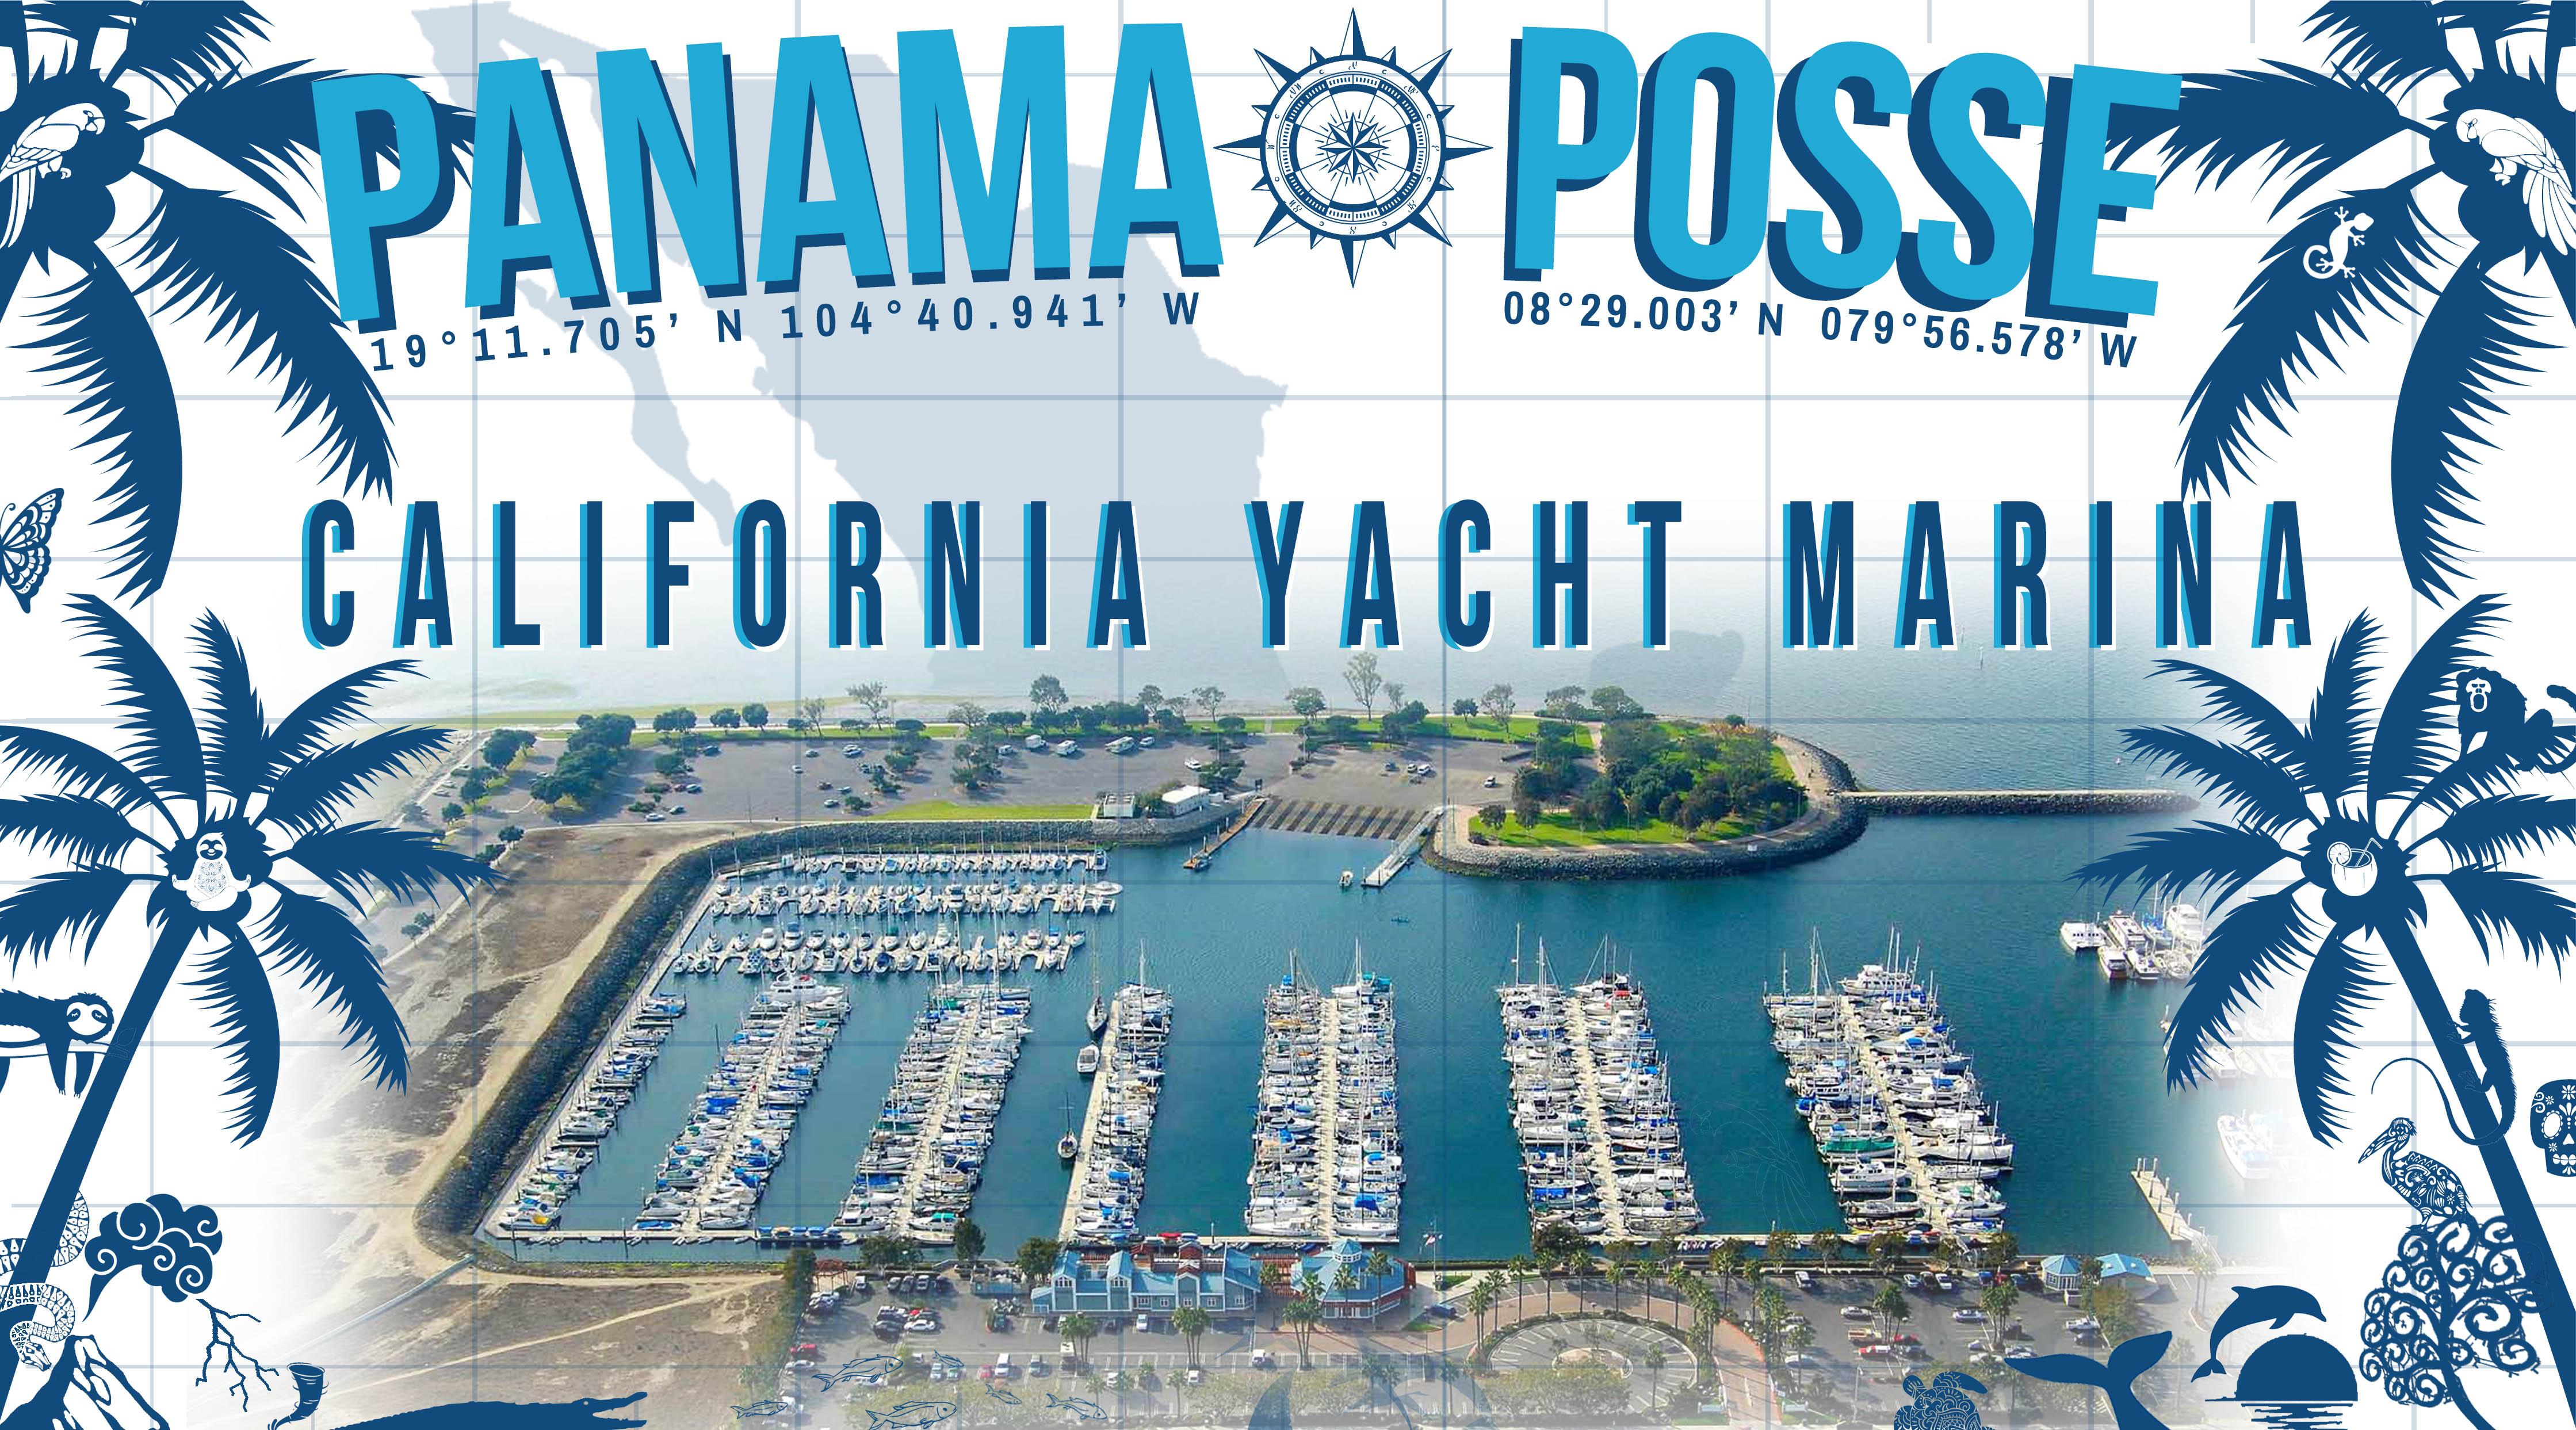 California Yacht Marina San Diego